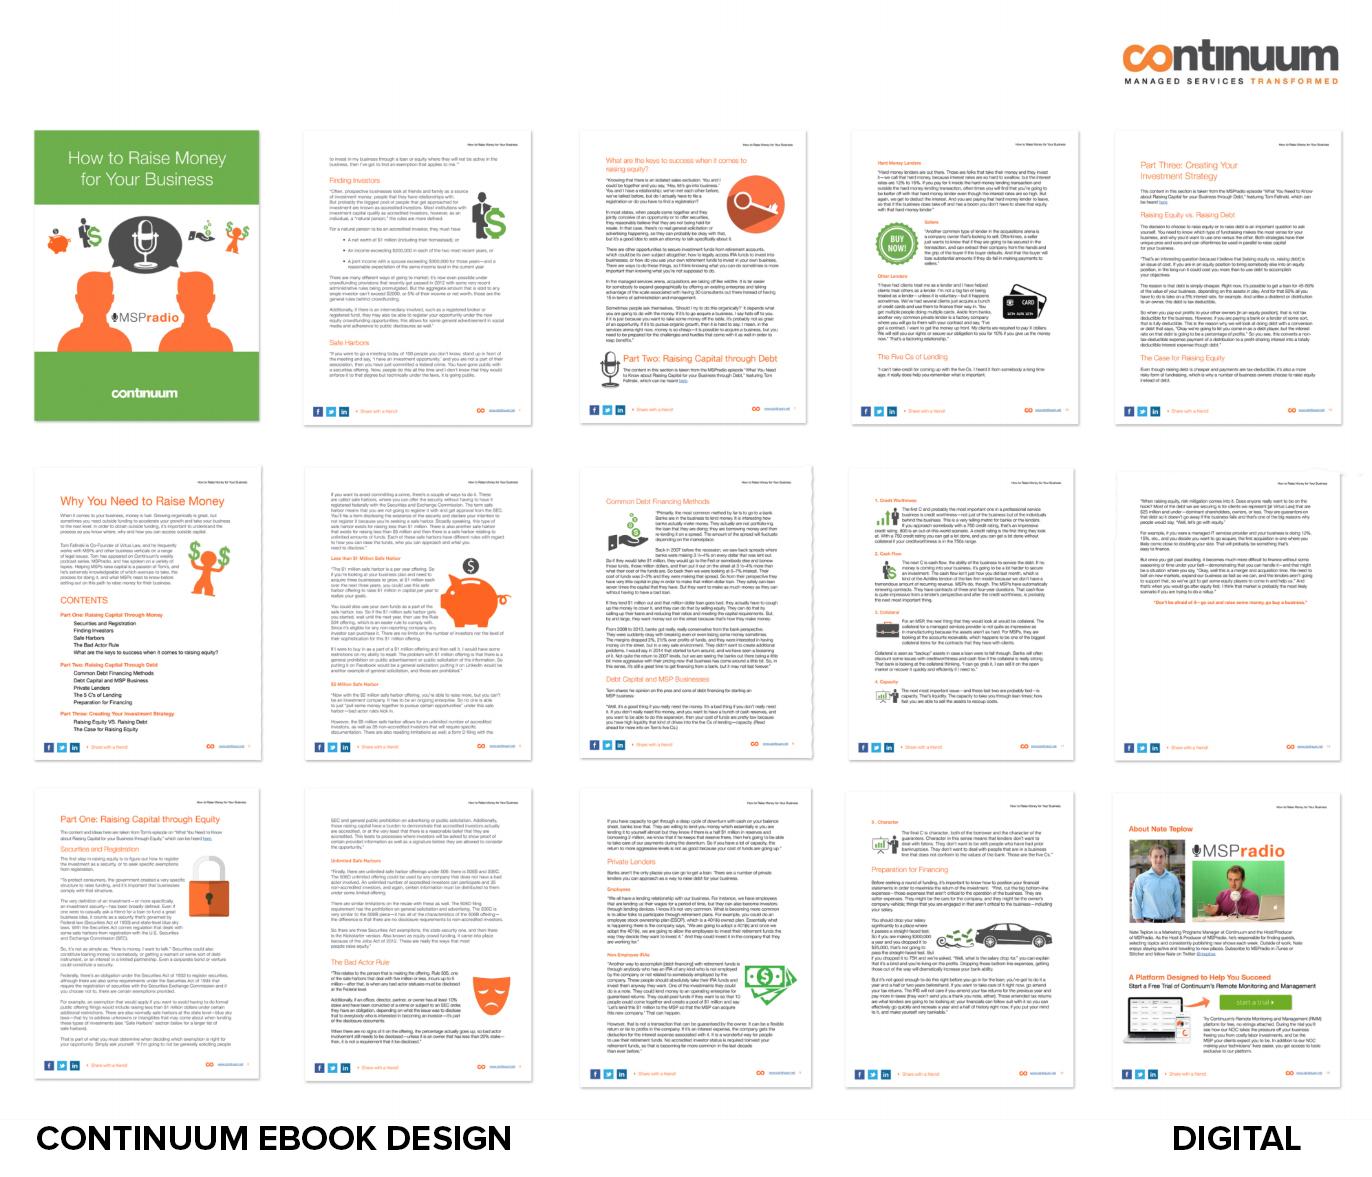 FINAL-CONTINUUM-EBOOK-DESIGN.jpg